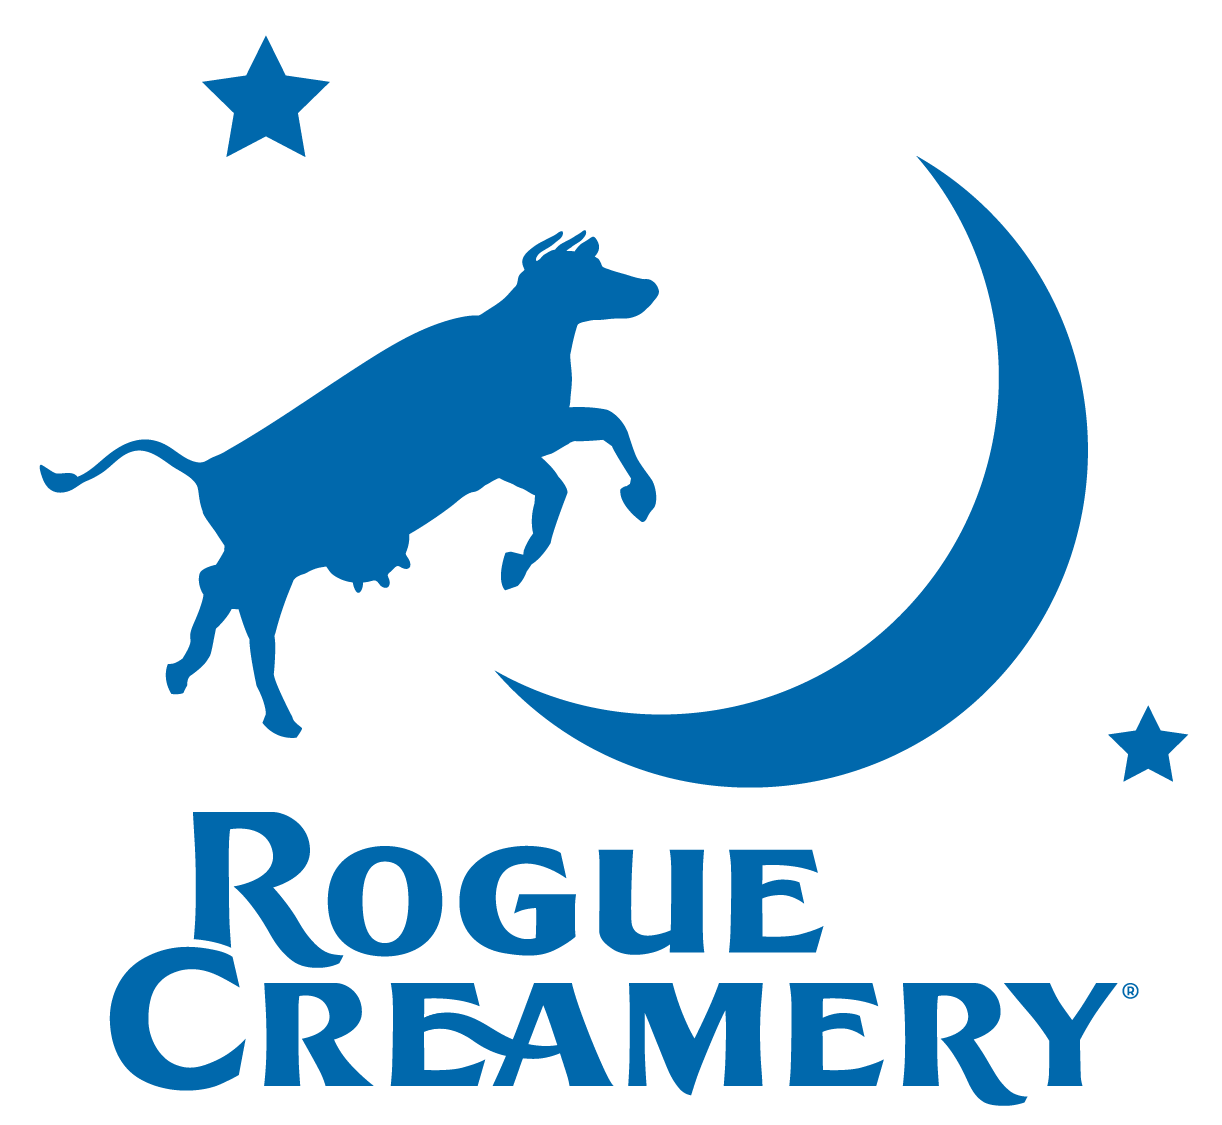 Rogue_Creamery_Logo.png